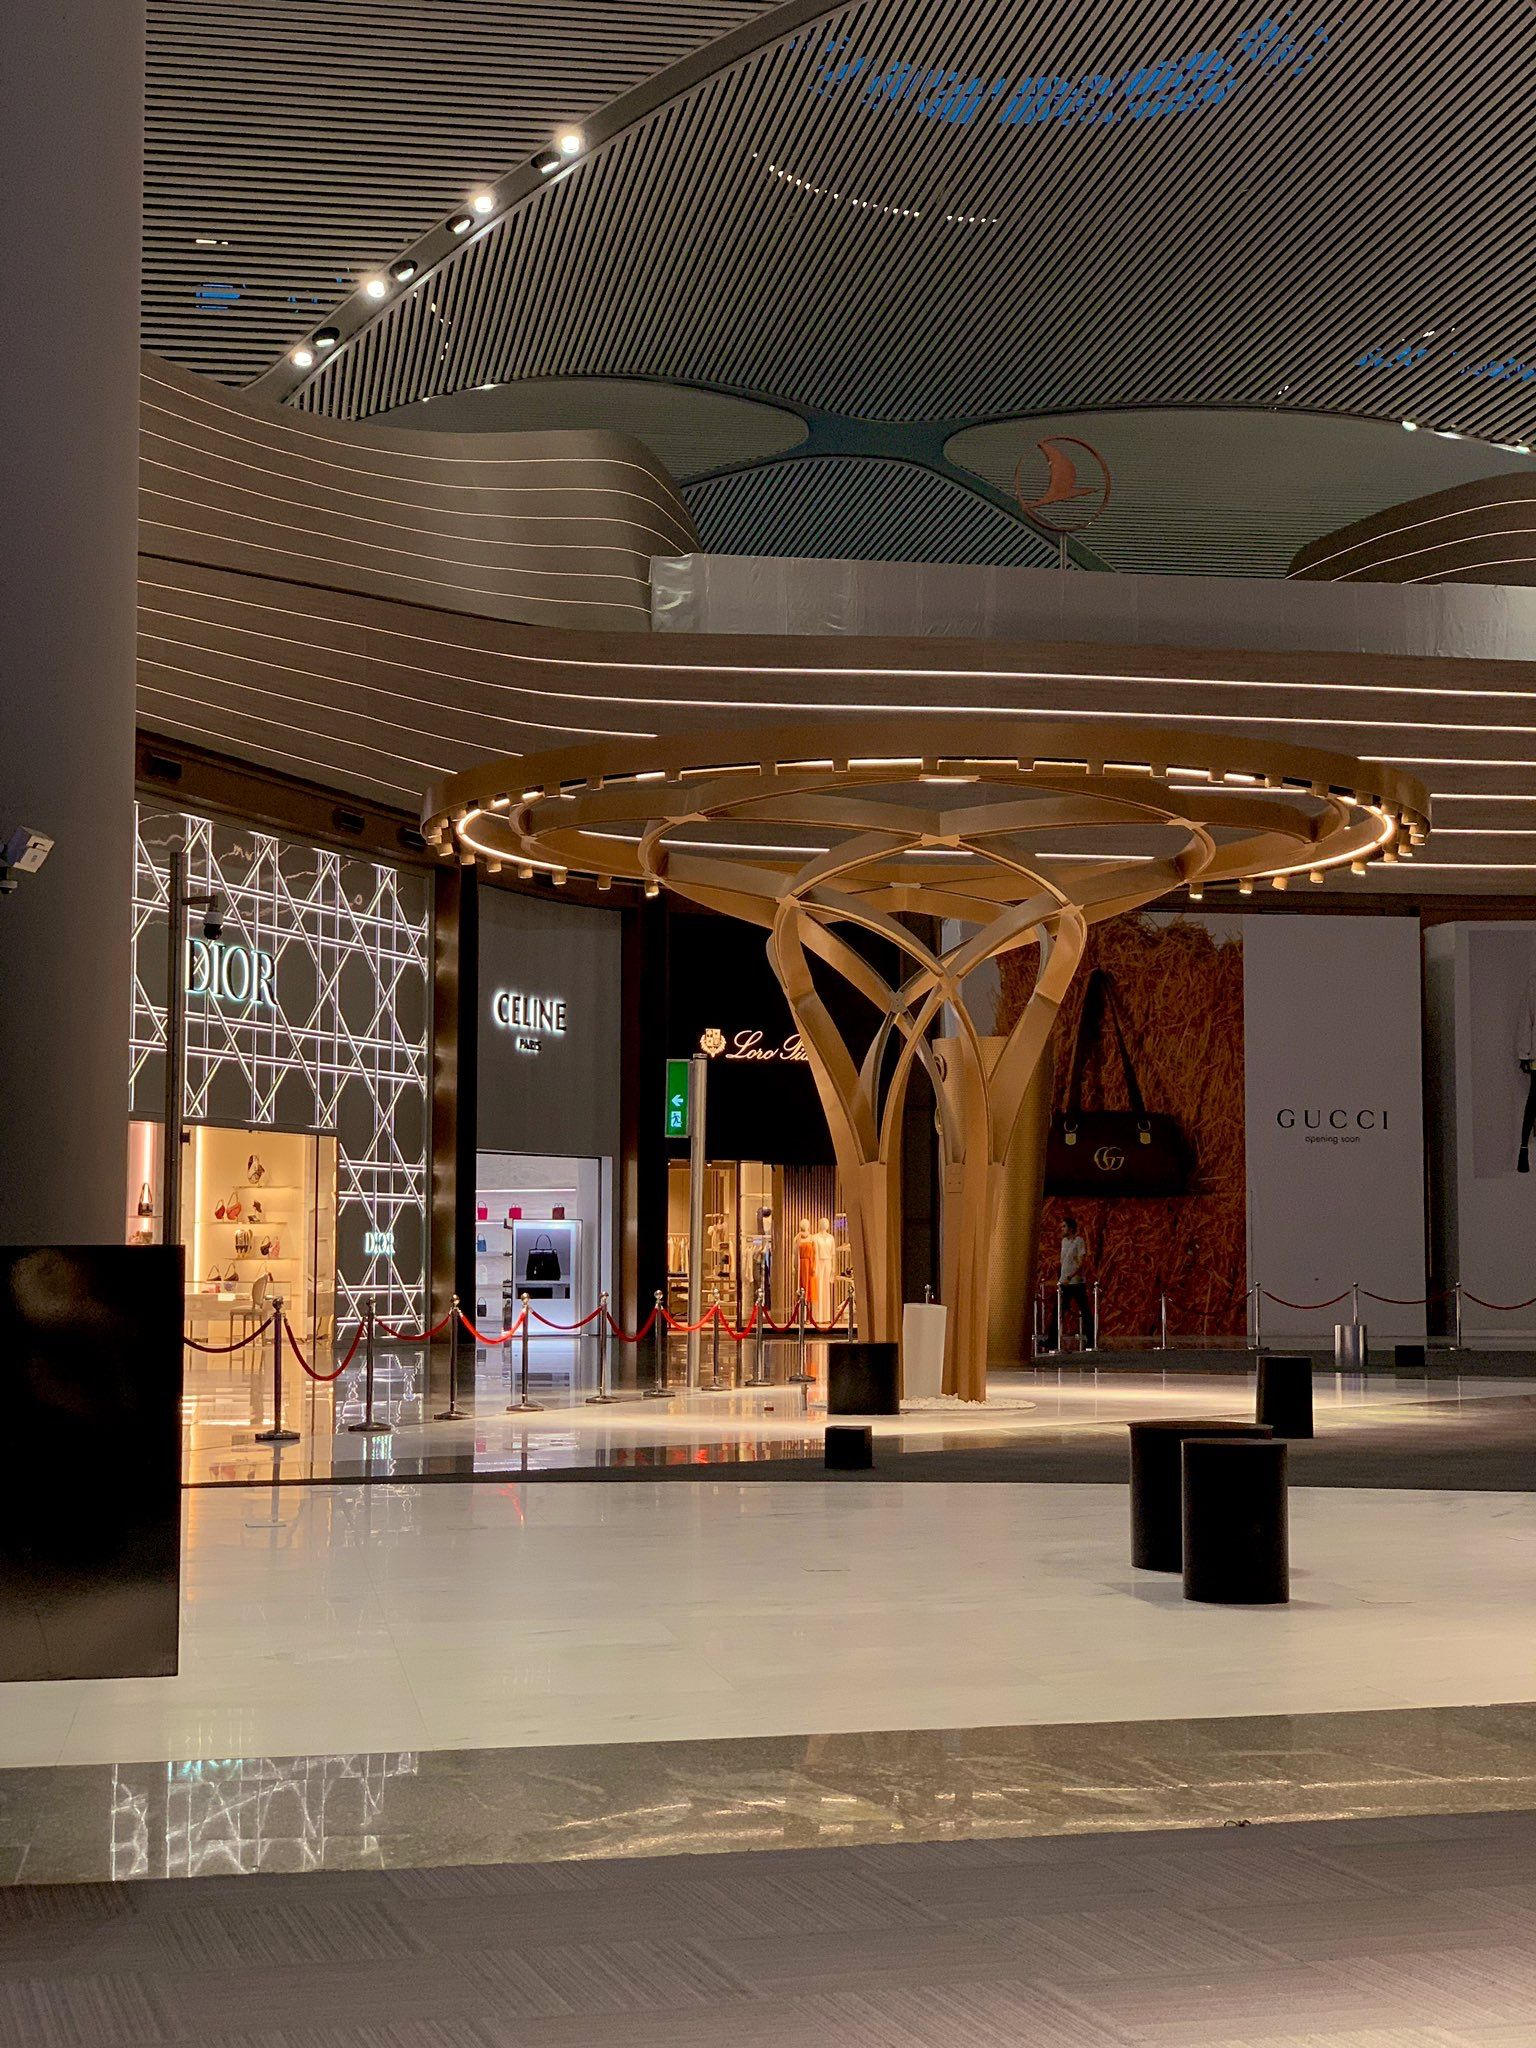 مطار اسطنبول الجديد House Styles Decor Home Decor